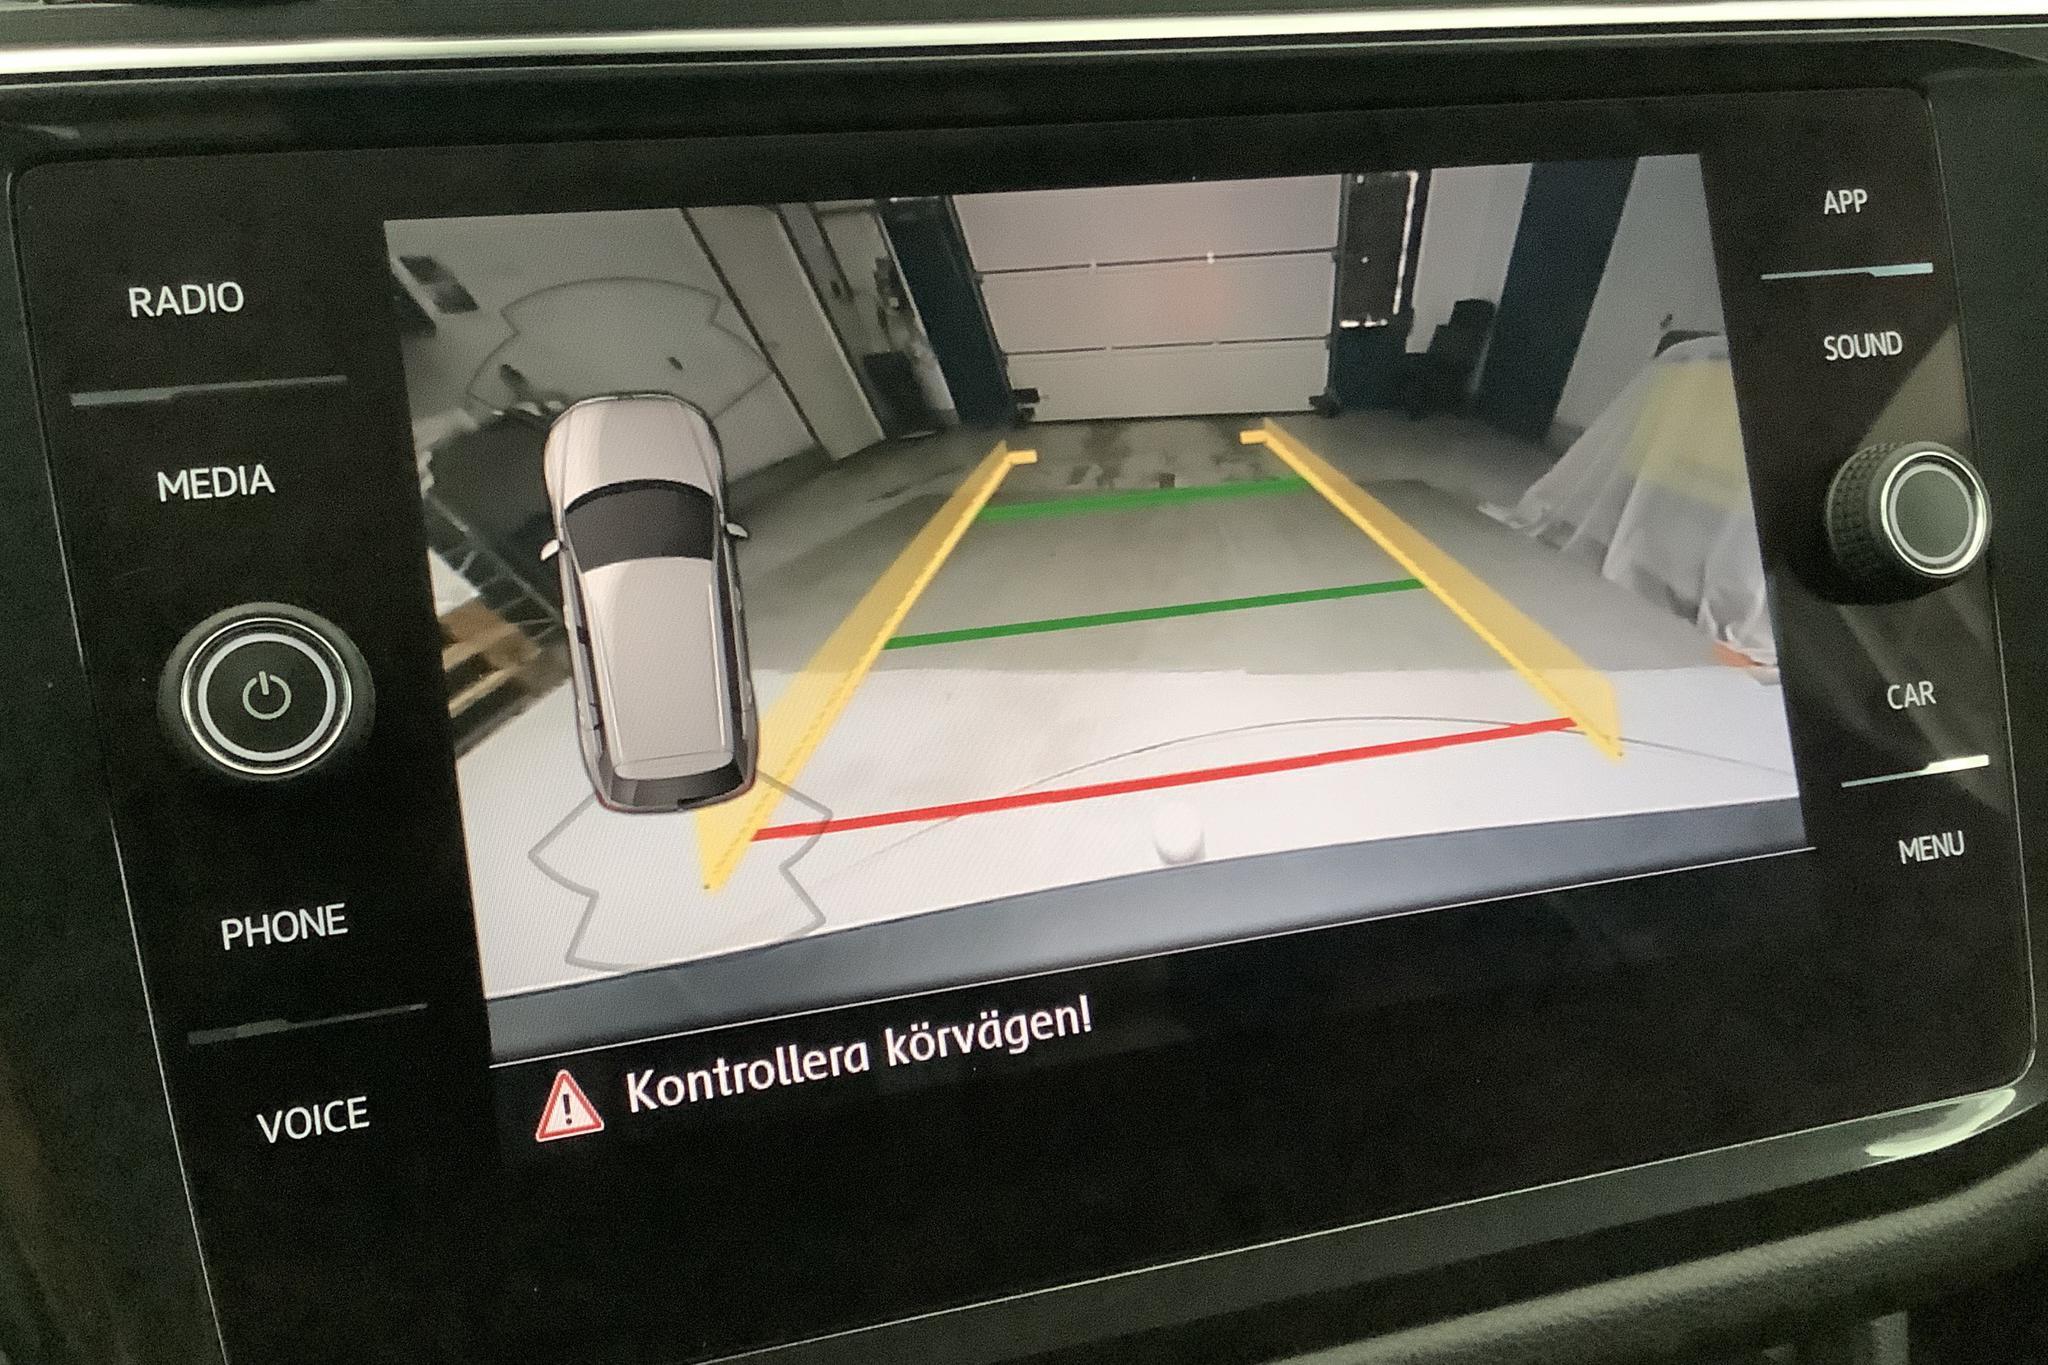 VW Tiguan Allspace 2.0 TDI 4MOTION (190hk) - 75 970 km - Automatic - Dark Grey - 2018